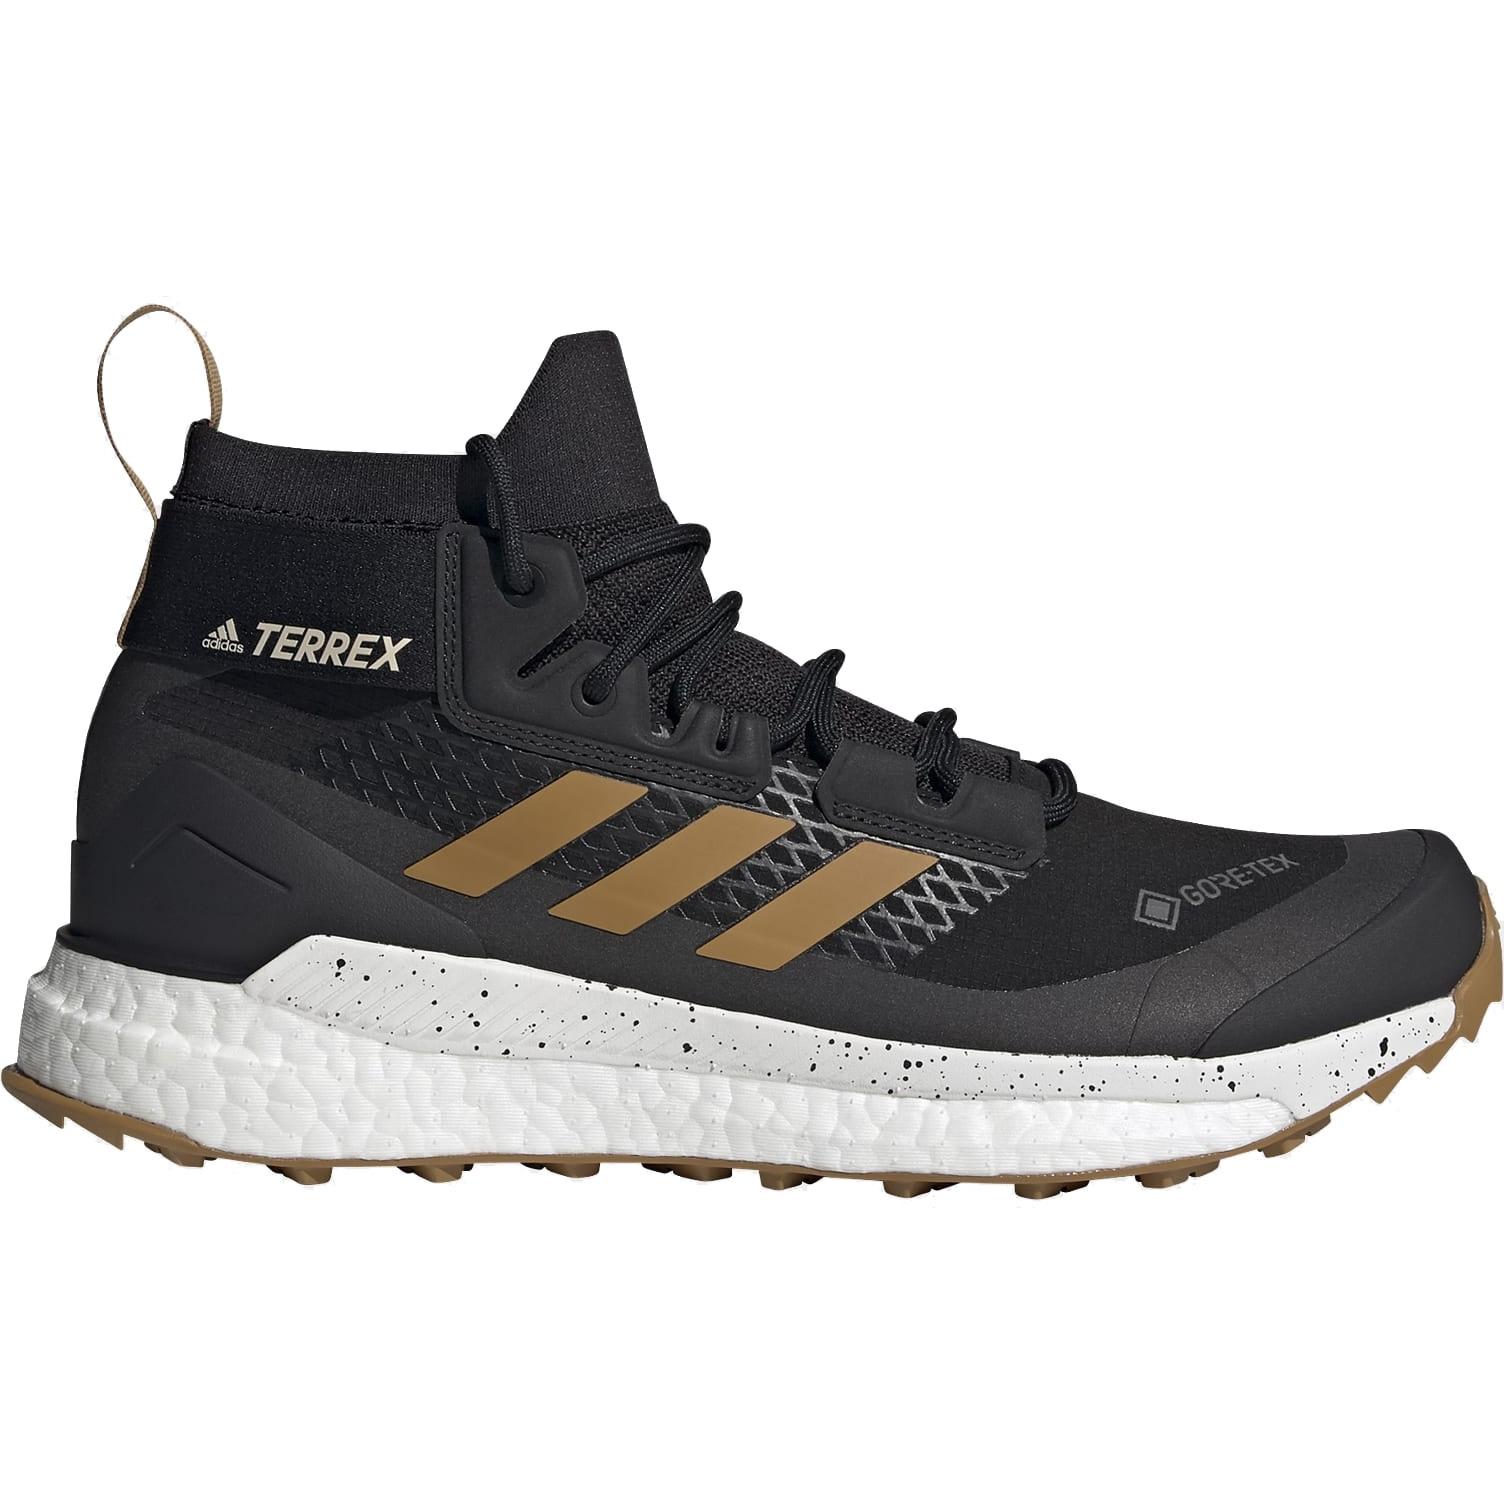 adidas TERREX Free Hiker GORE-TEX Zapatillas de Senderismo Hombre - core black/mesa/crystal white FZ2507